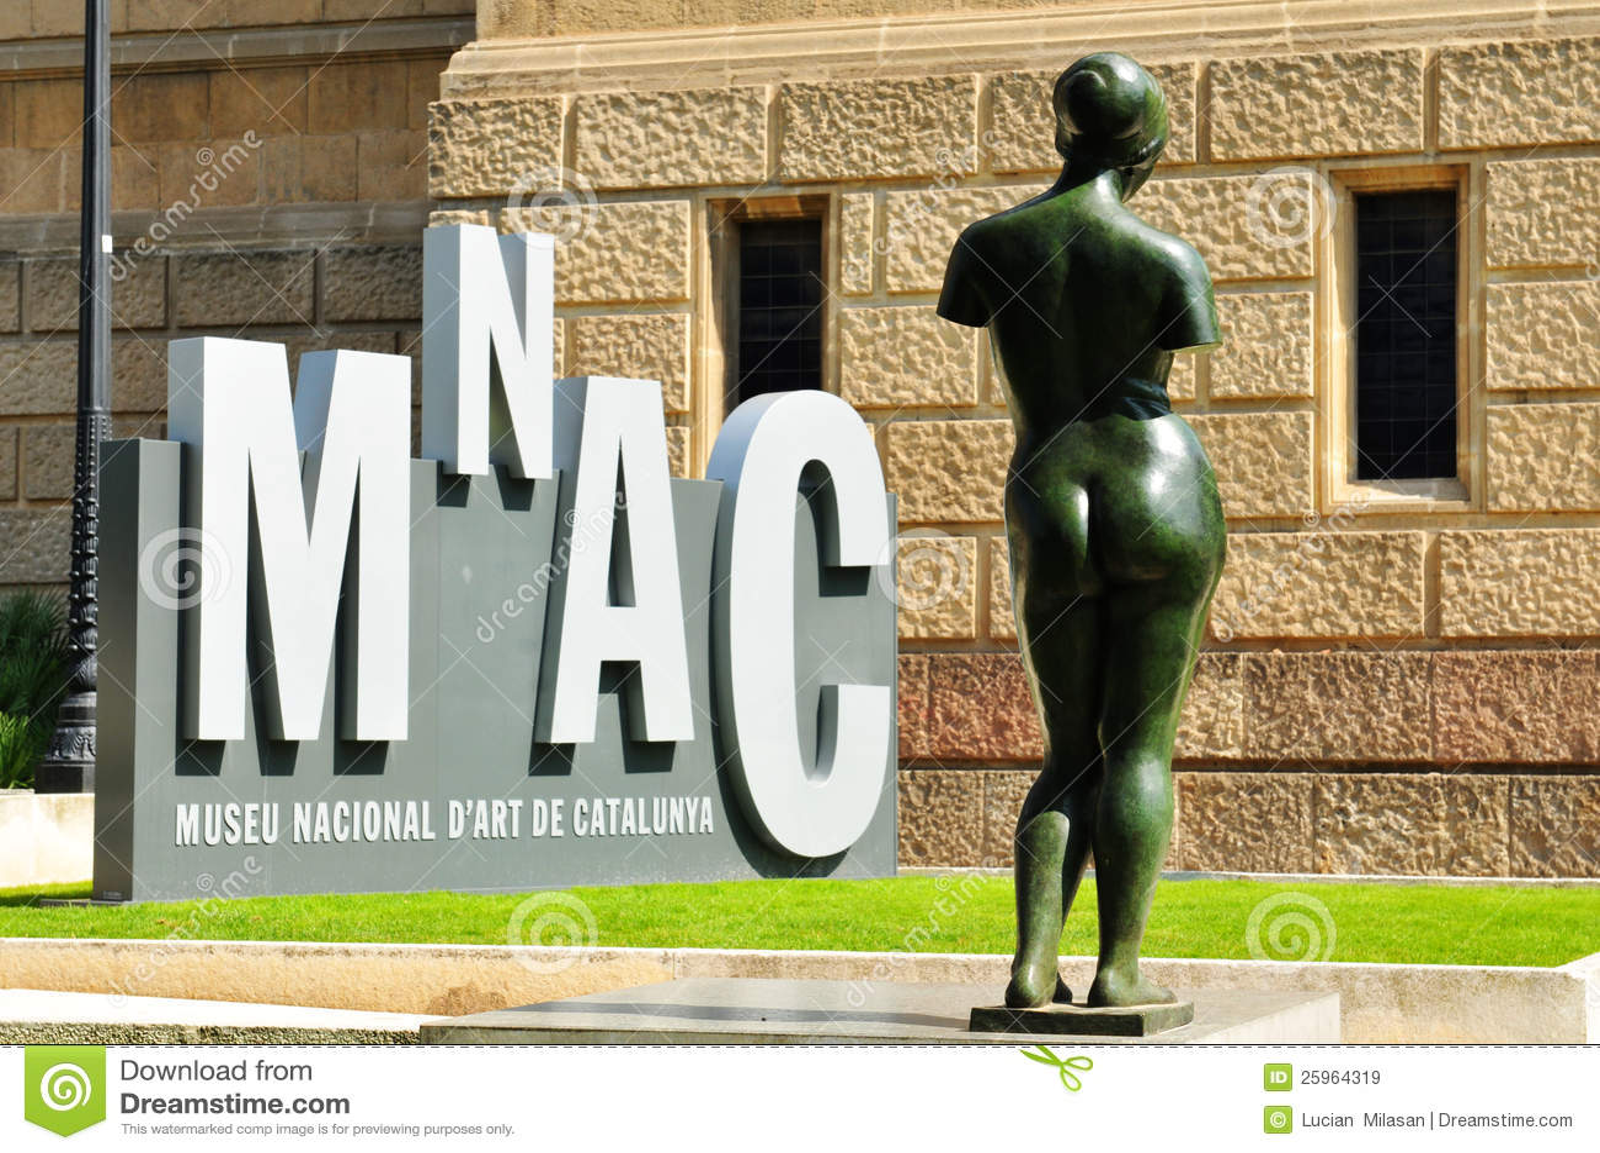 National art museum of catalonia editorial stock image for Artiste peintre catalan